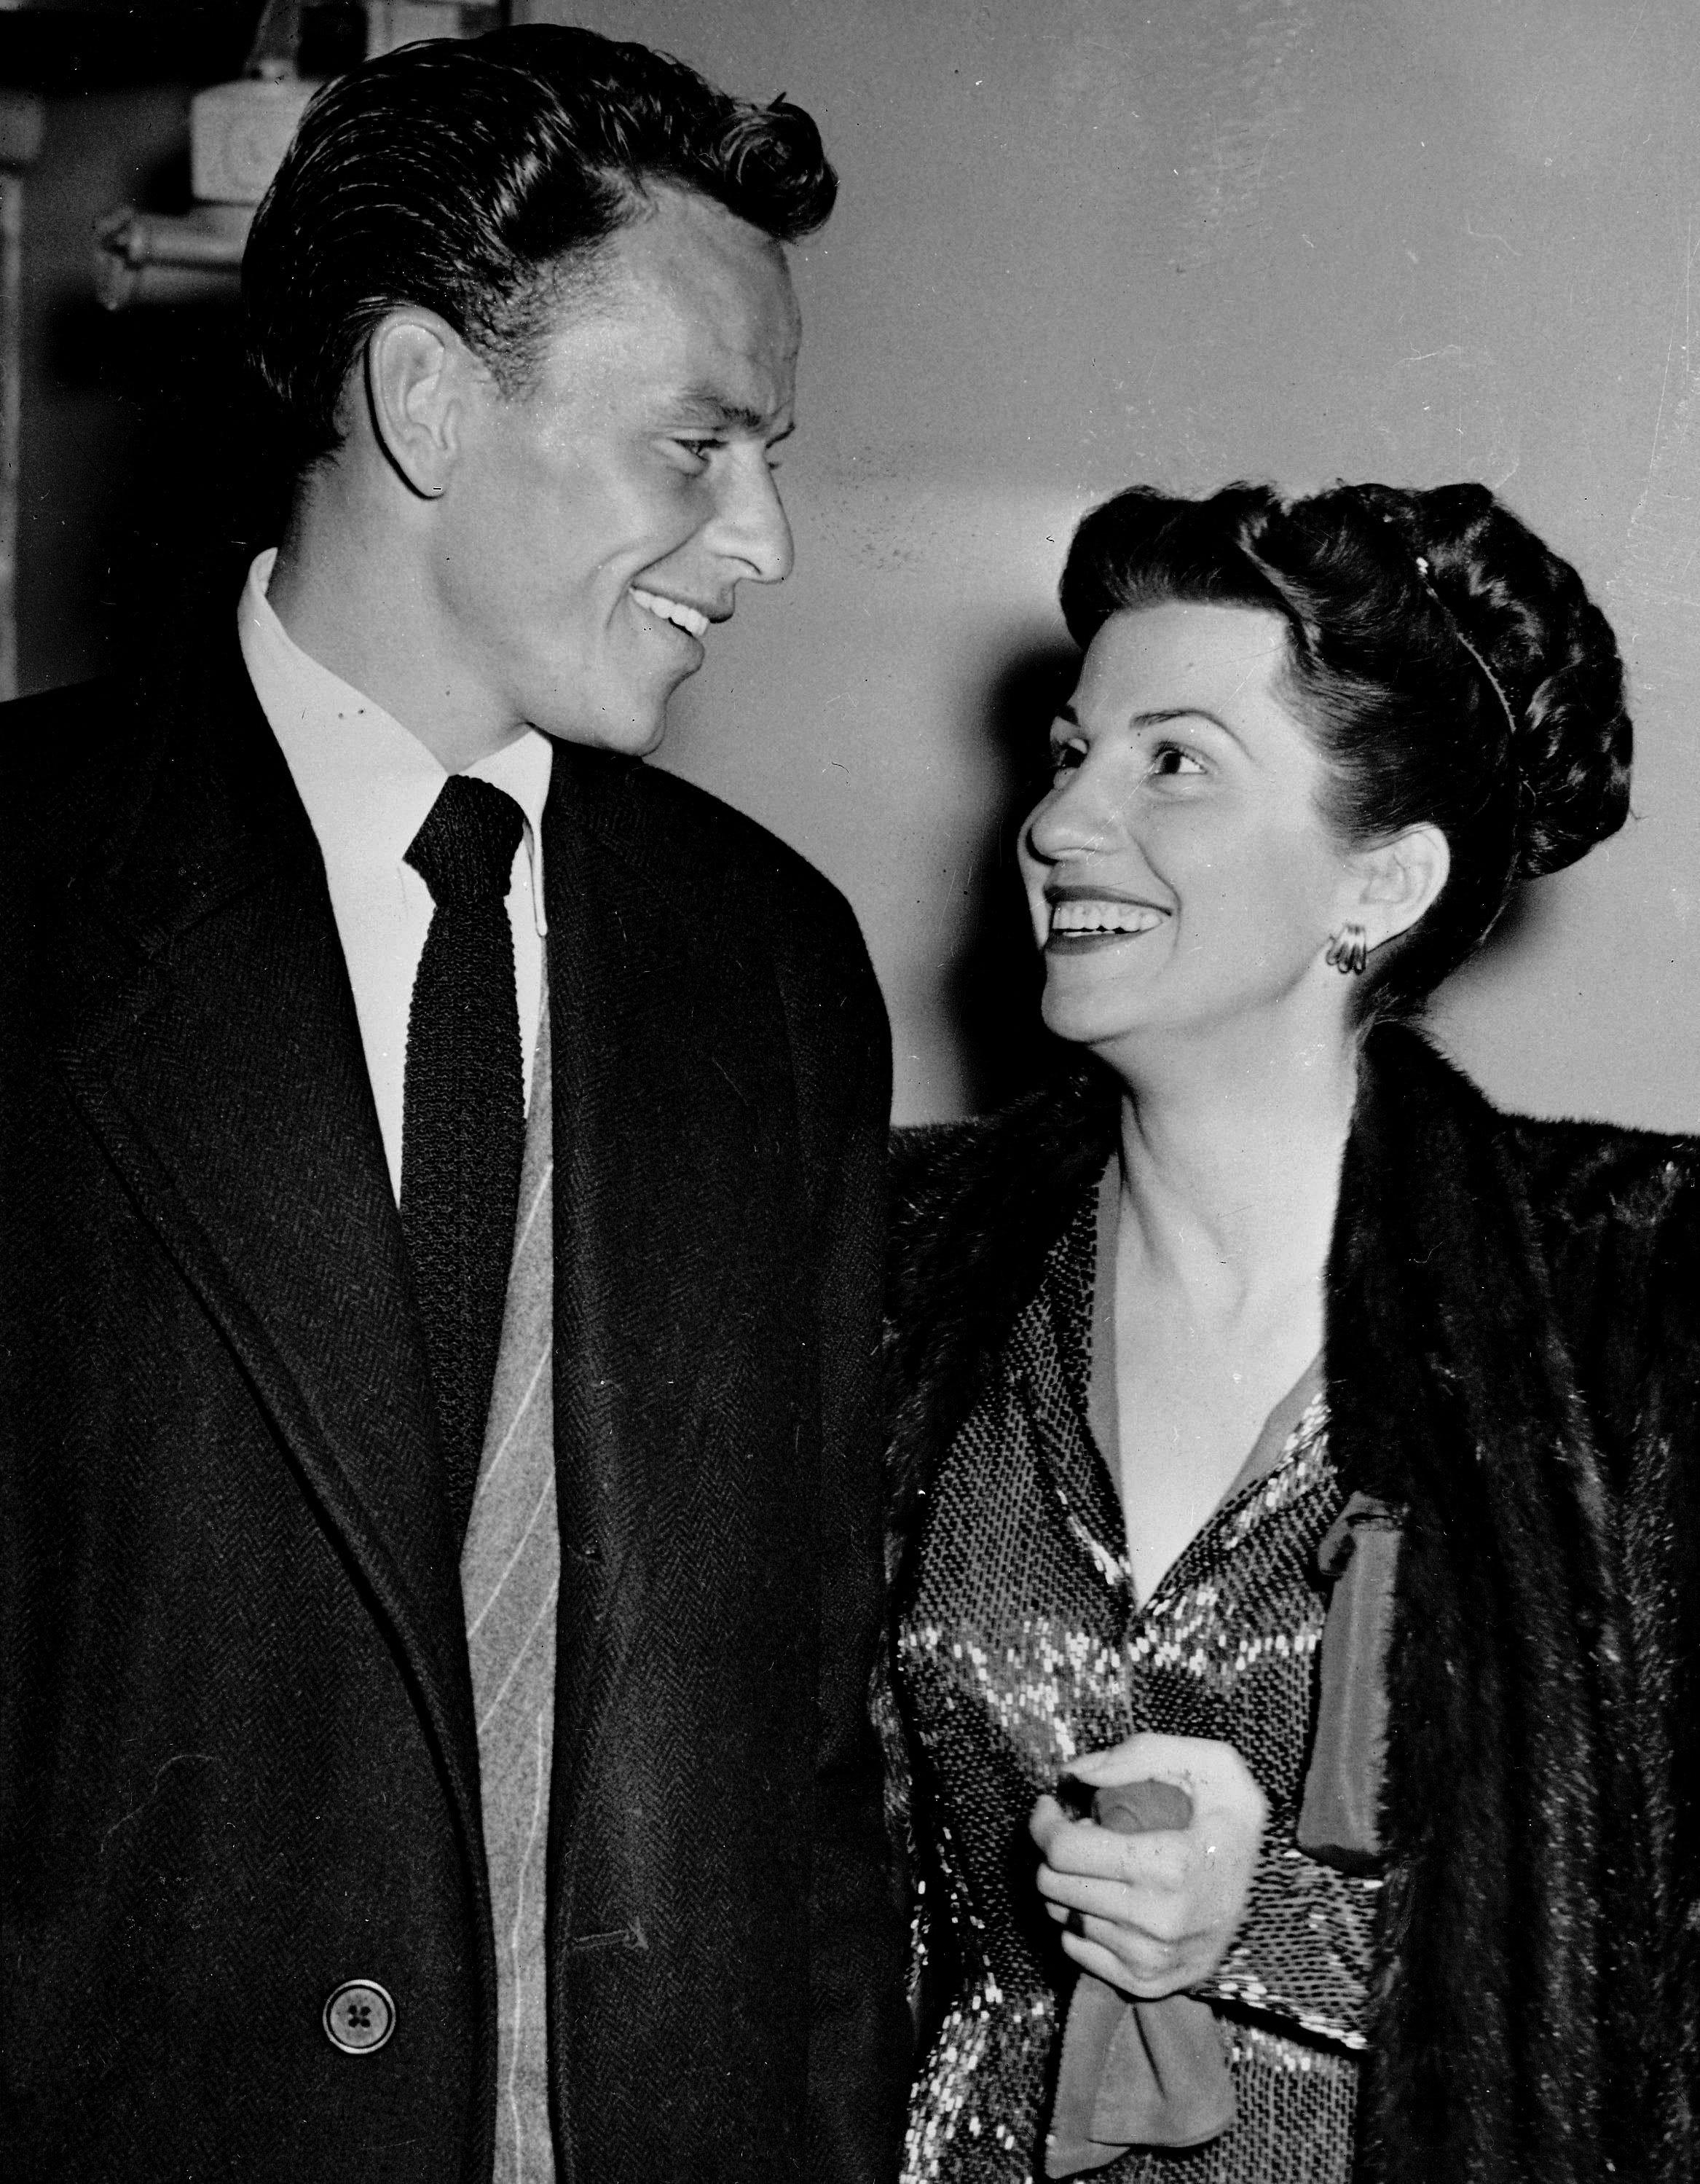 Nancy Sinatra Sr., ex-wife of Frank Sinatra, dies at 101